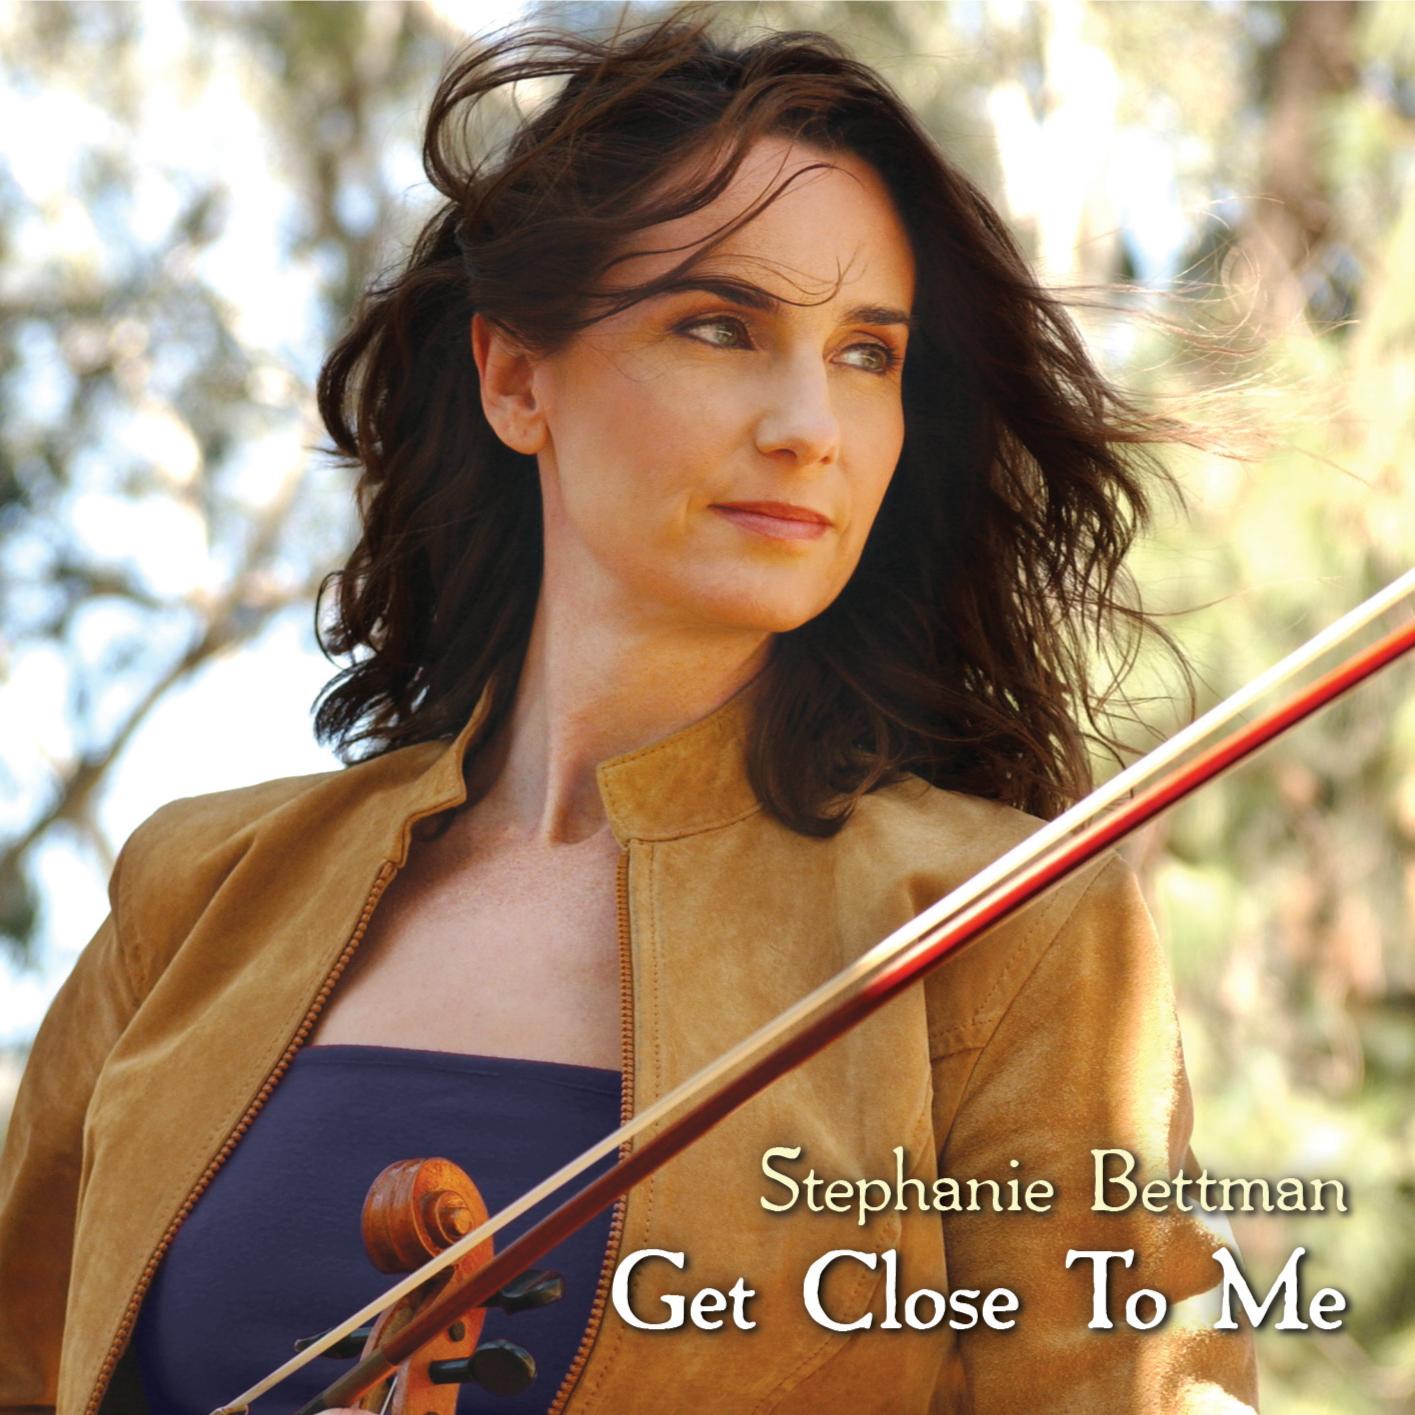 Get Close To Me by Stephanie Bettman